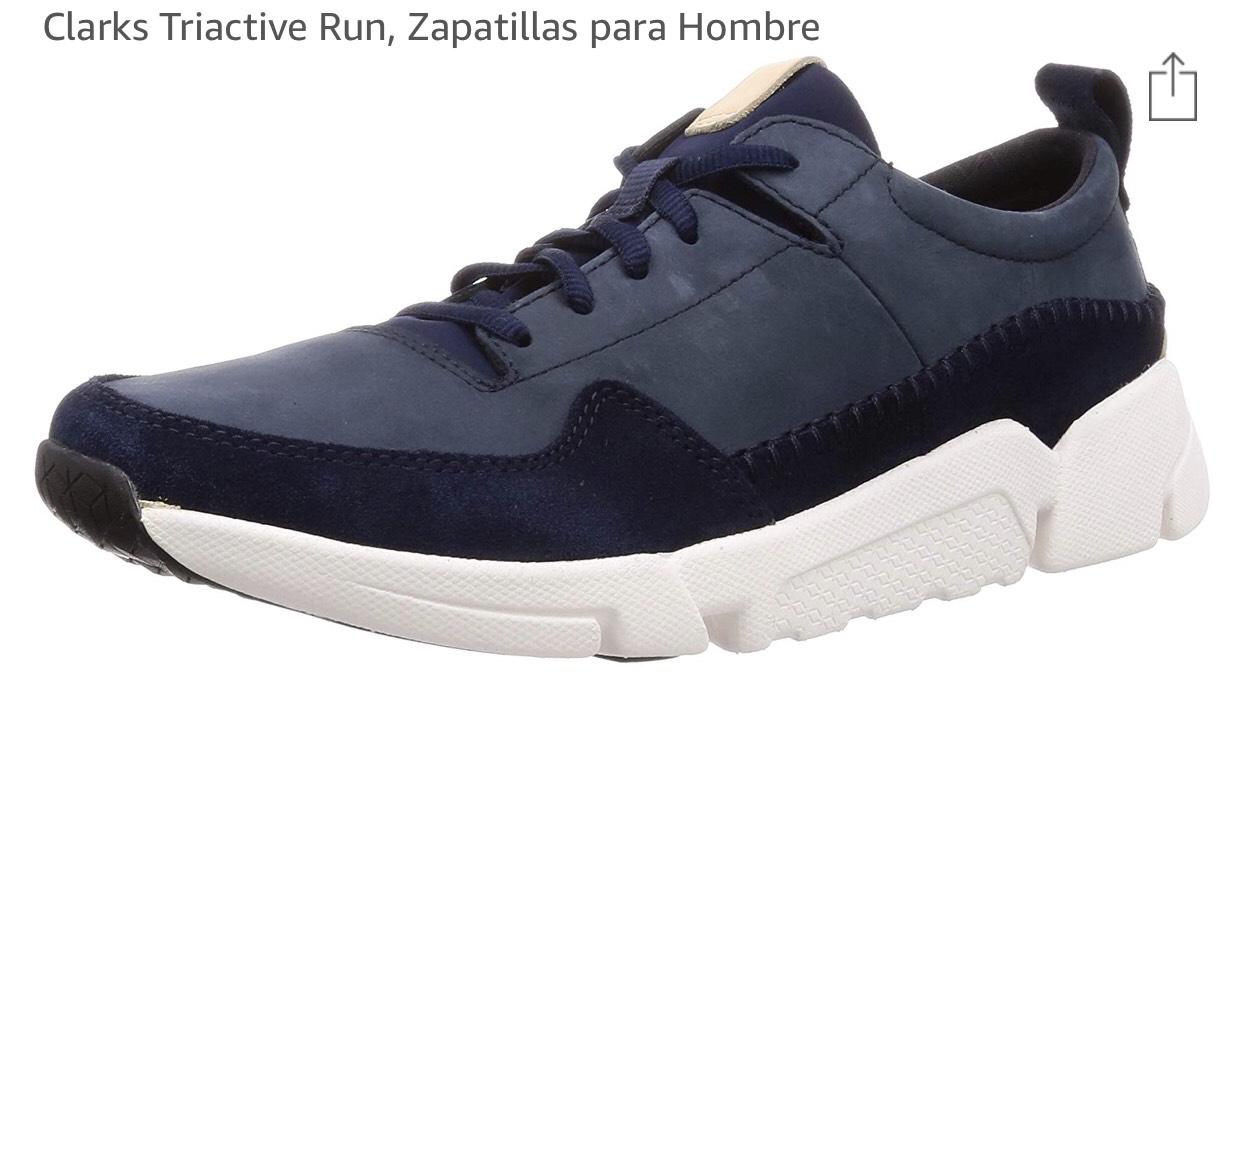 Clarks triactive Run zapatillas hombre